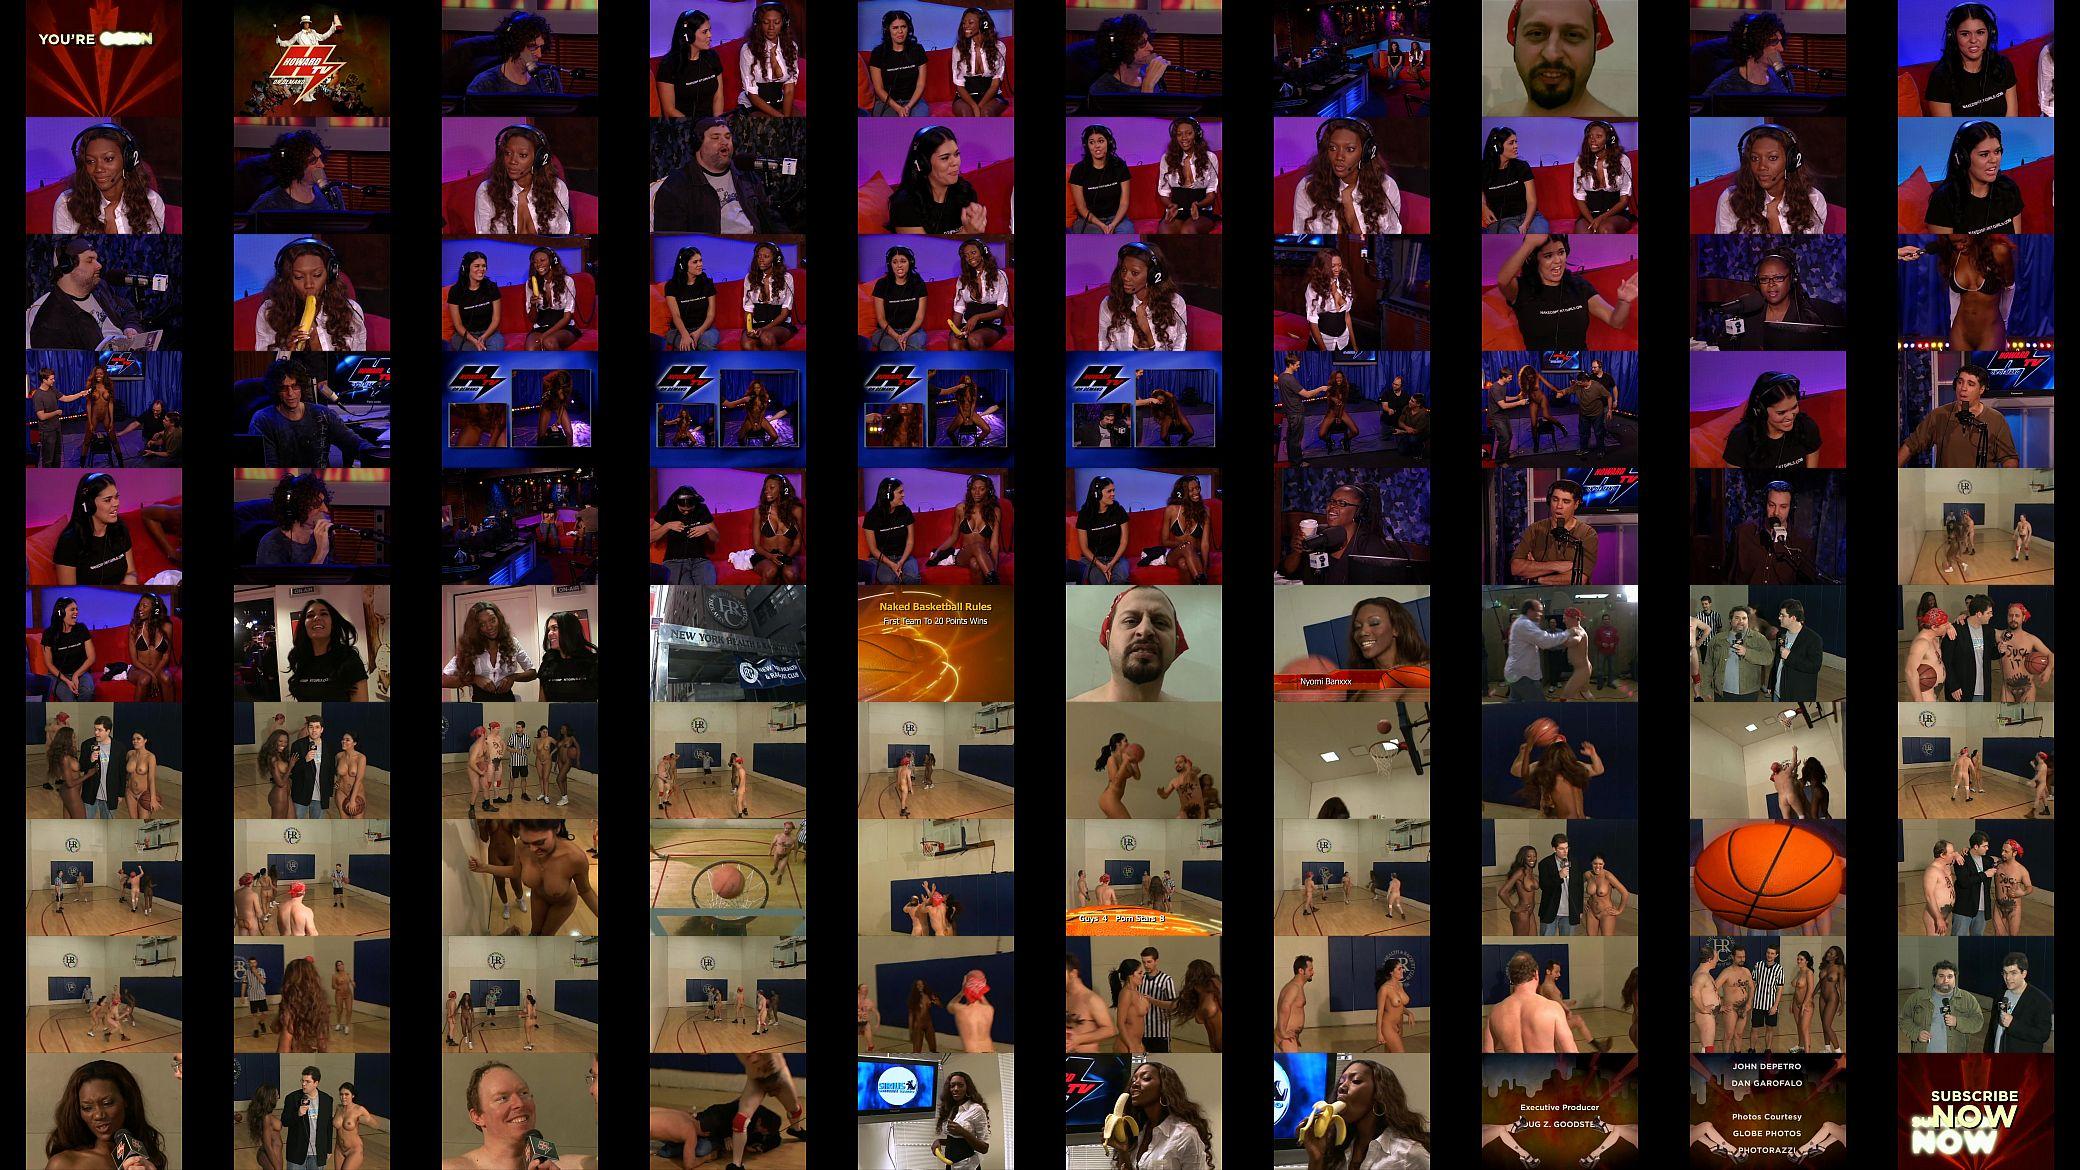 Howard Stern Naked Girls sexy naked basketball 2 on 2 howard stern - xvideos